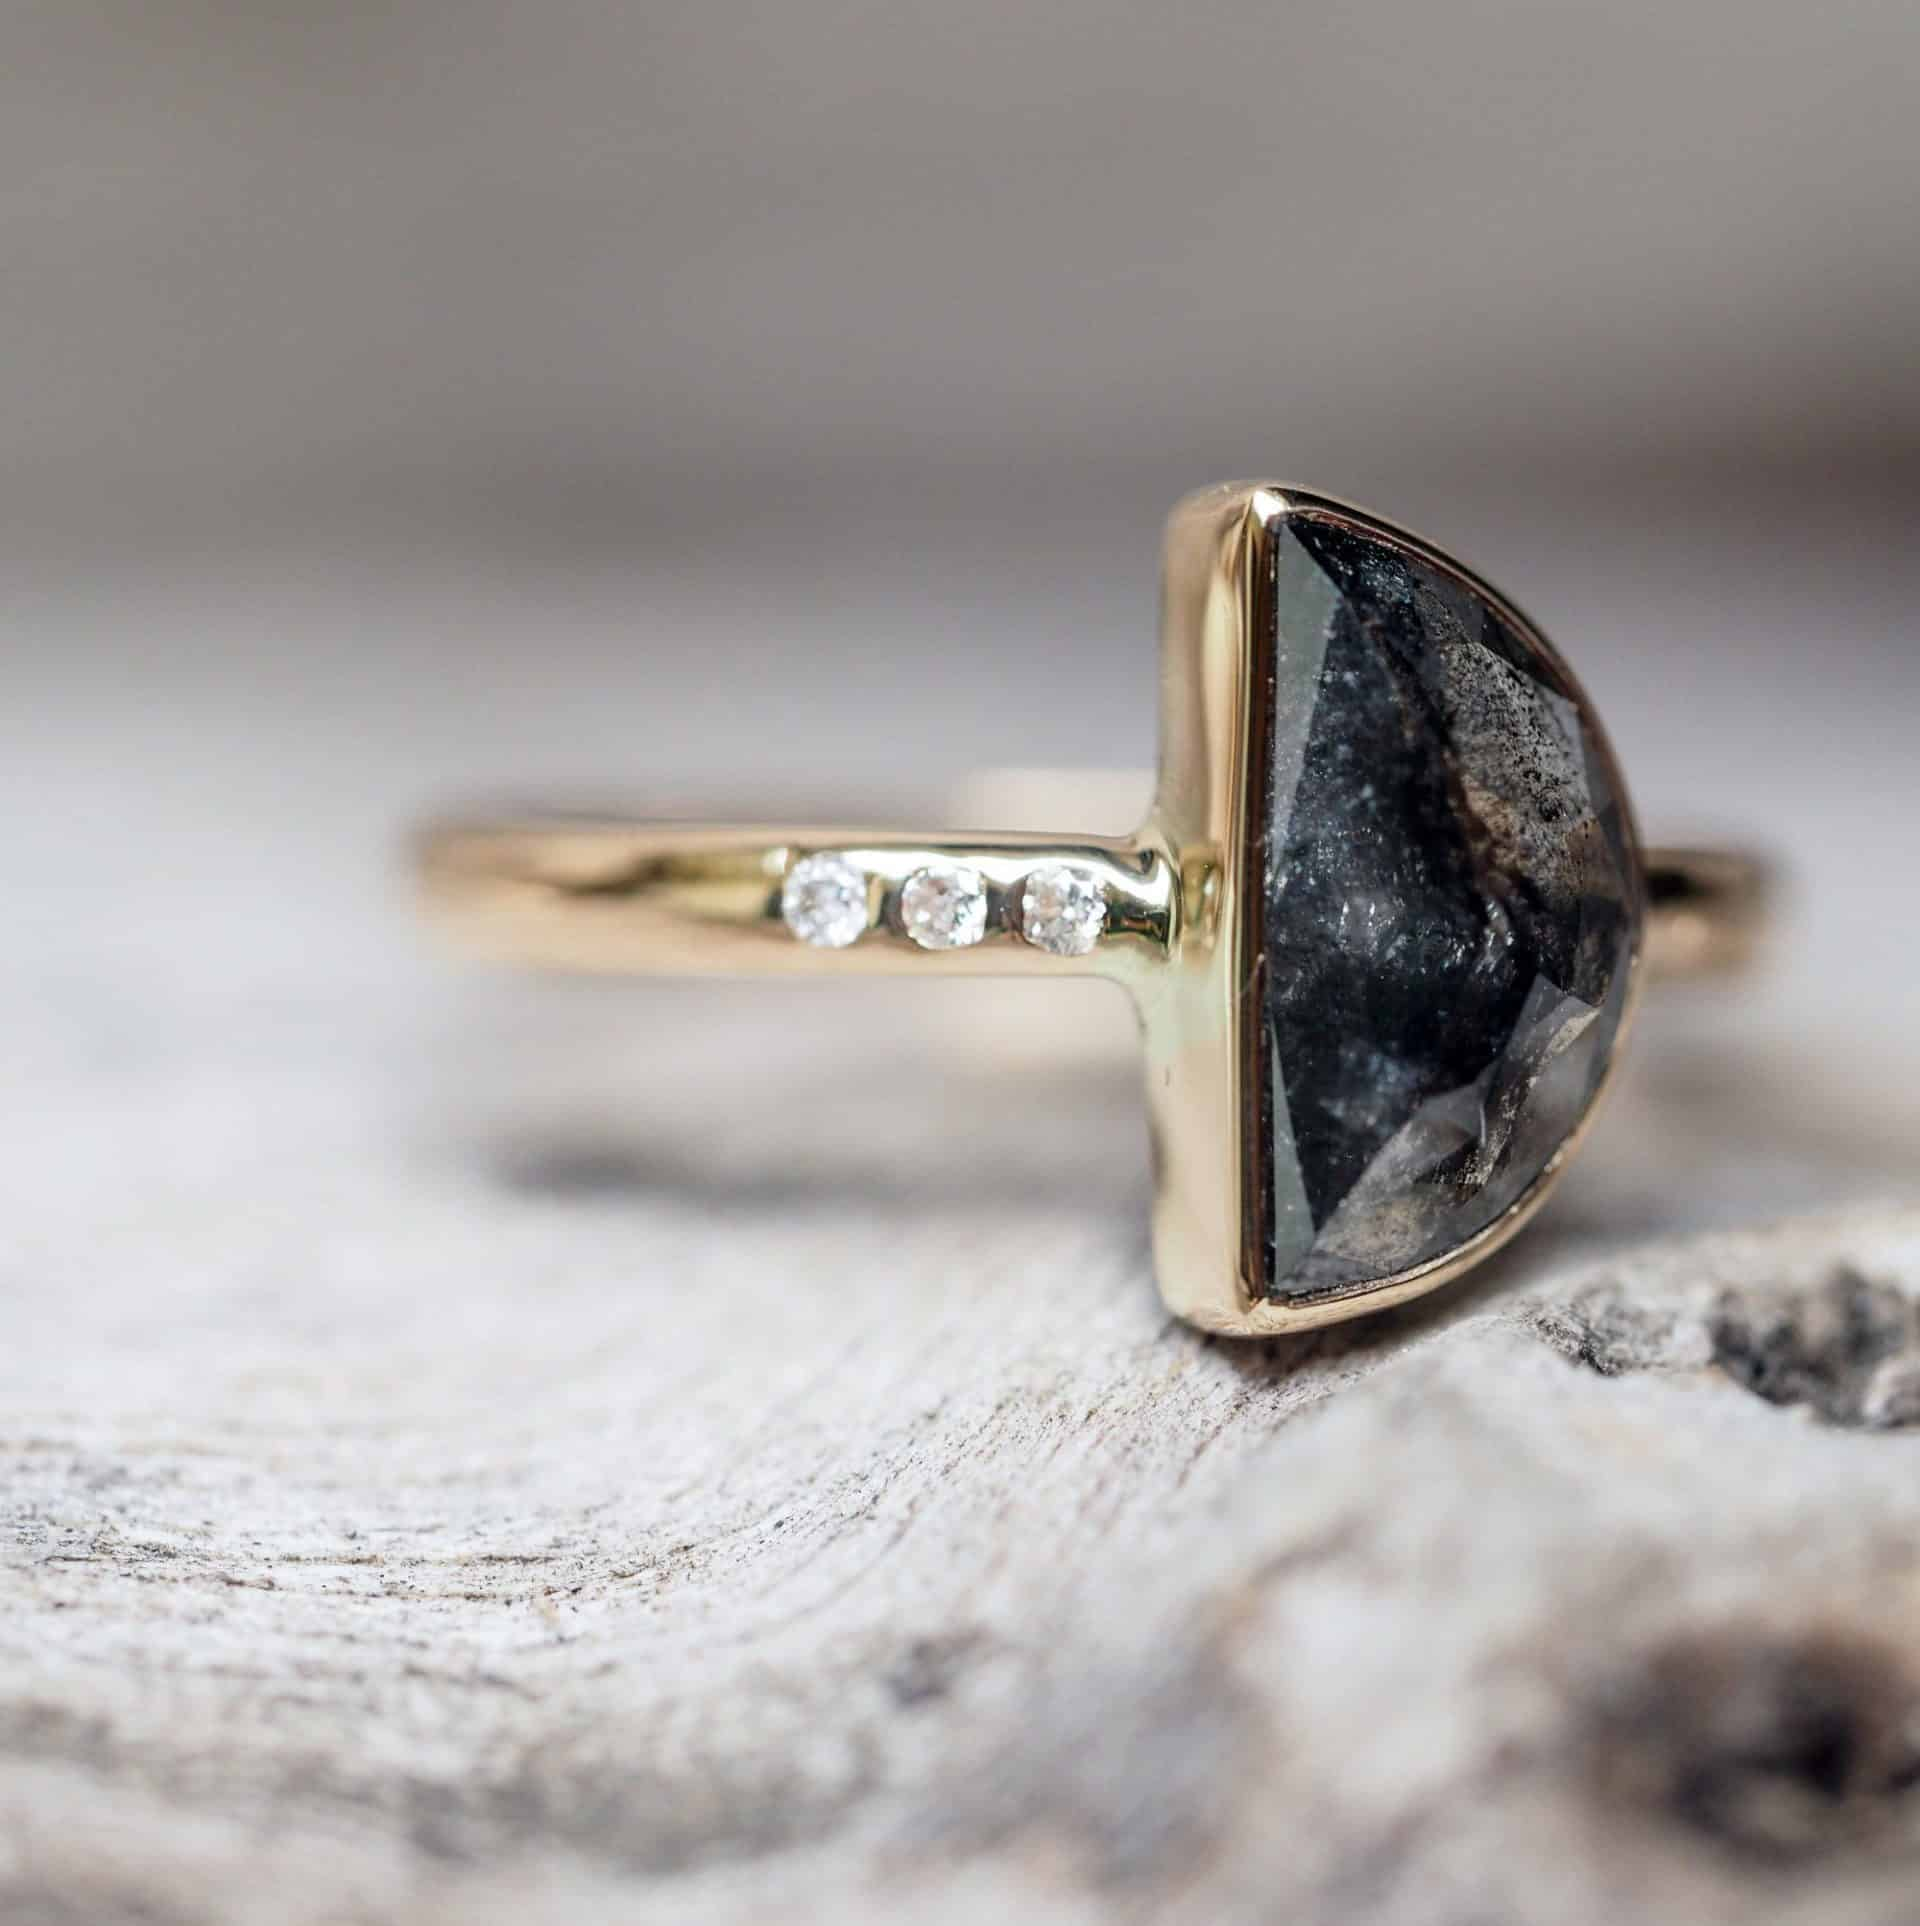 unique wedding ring with black stone